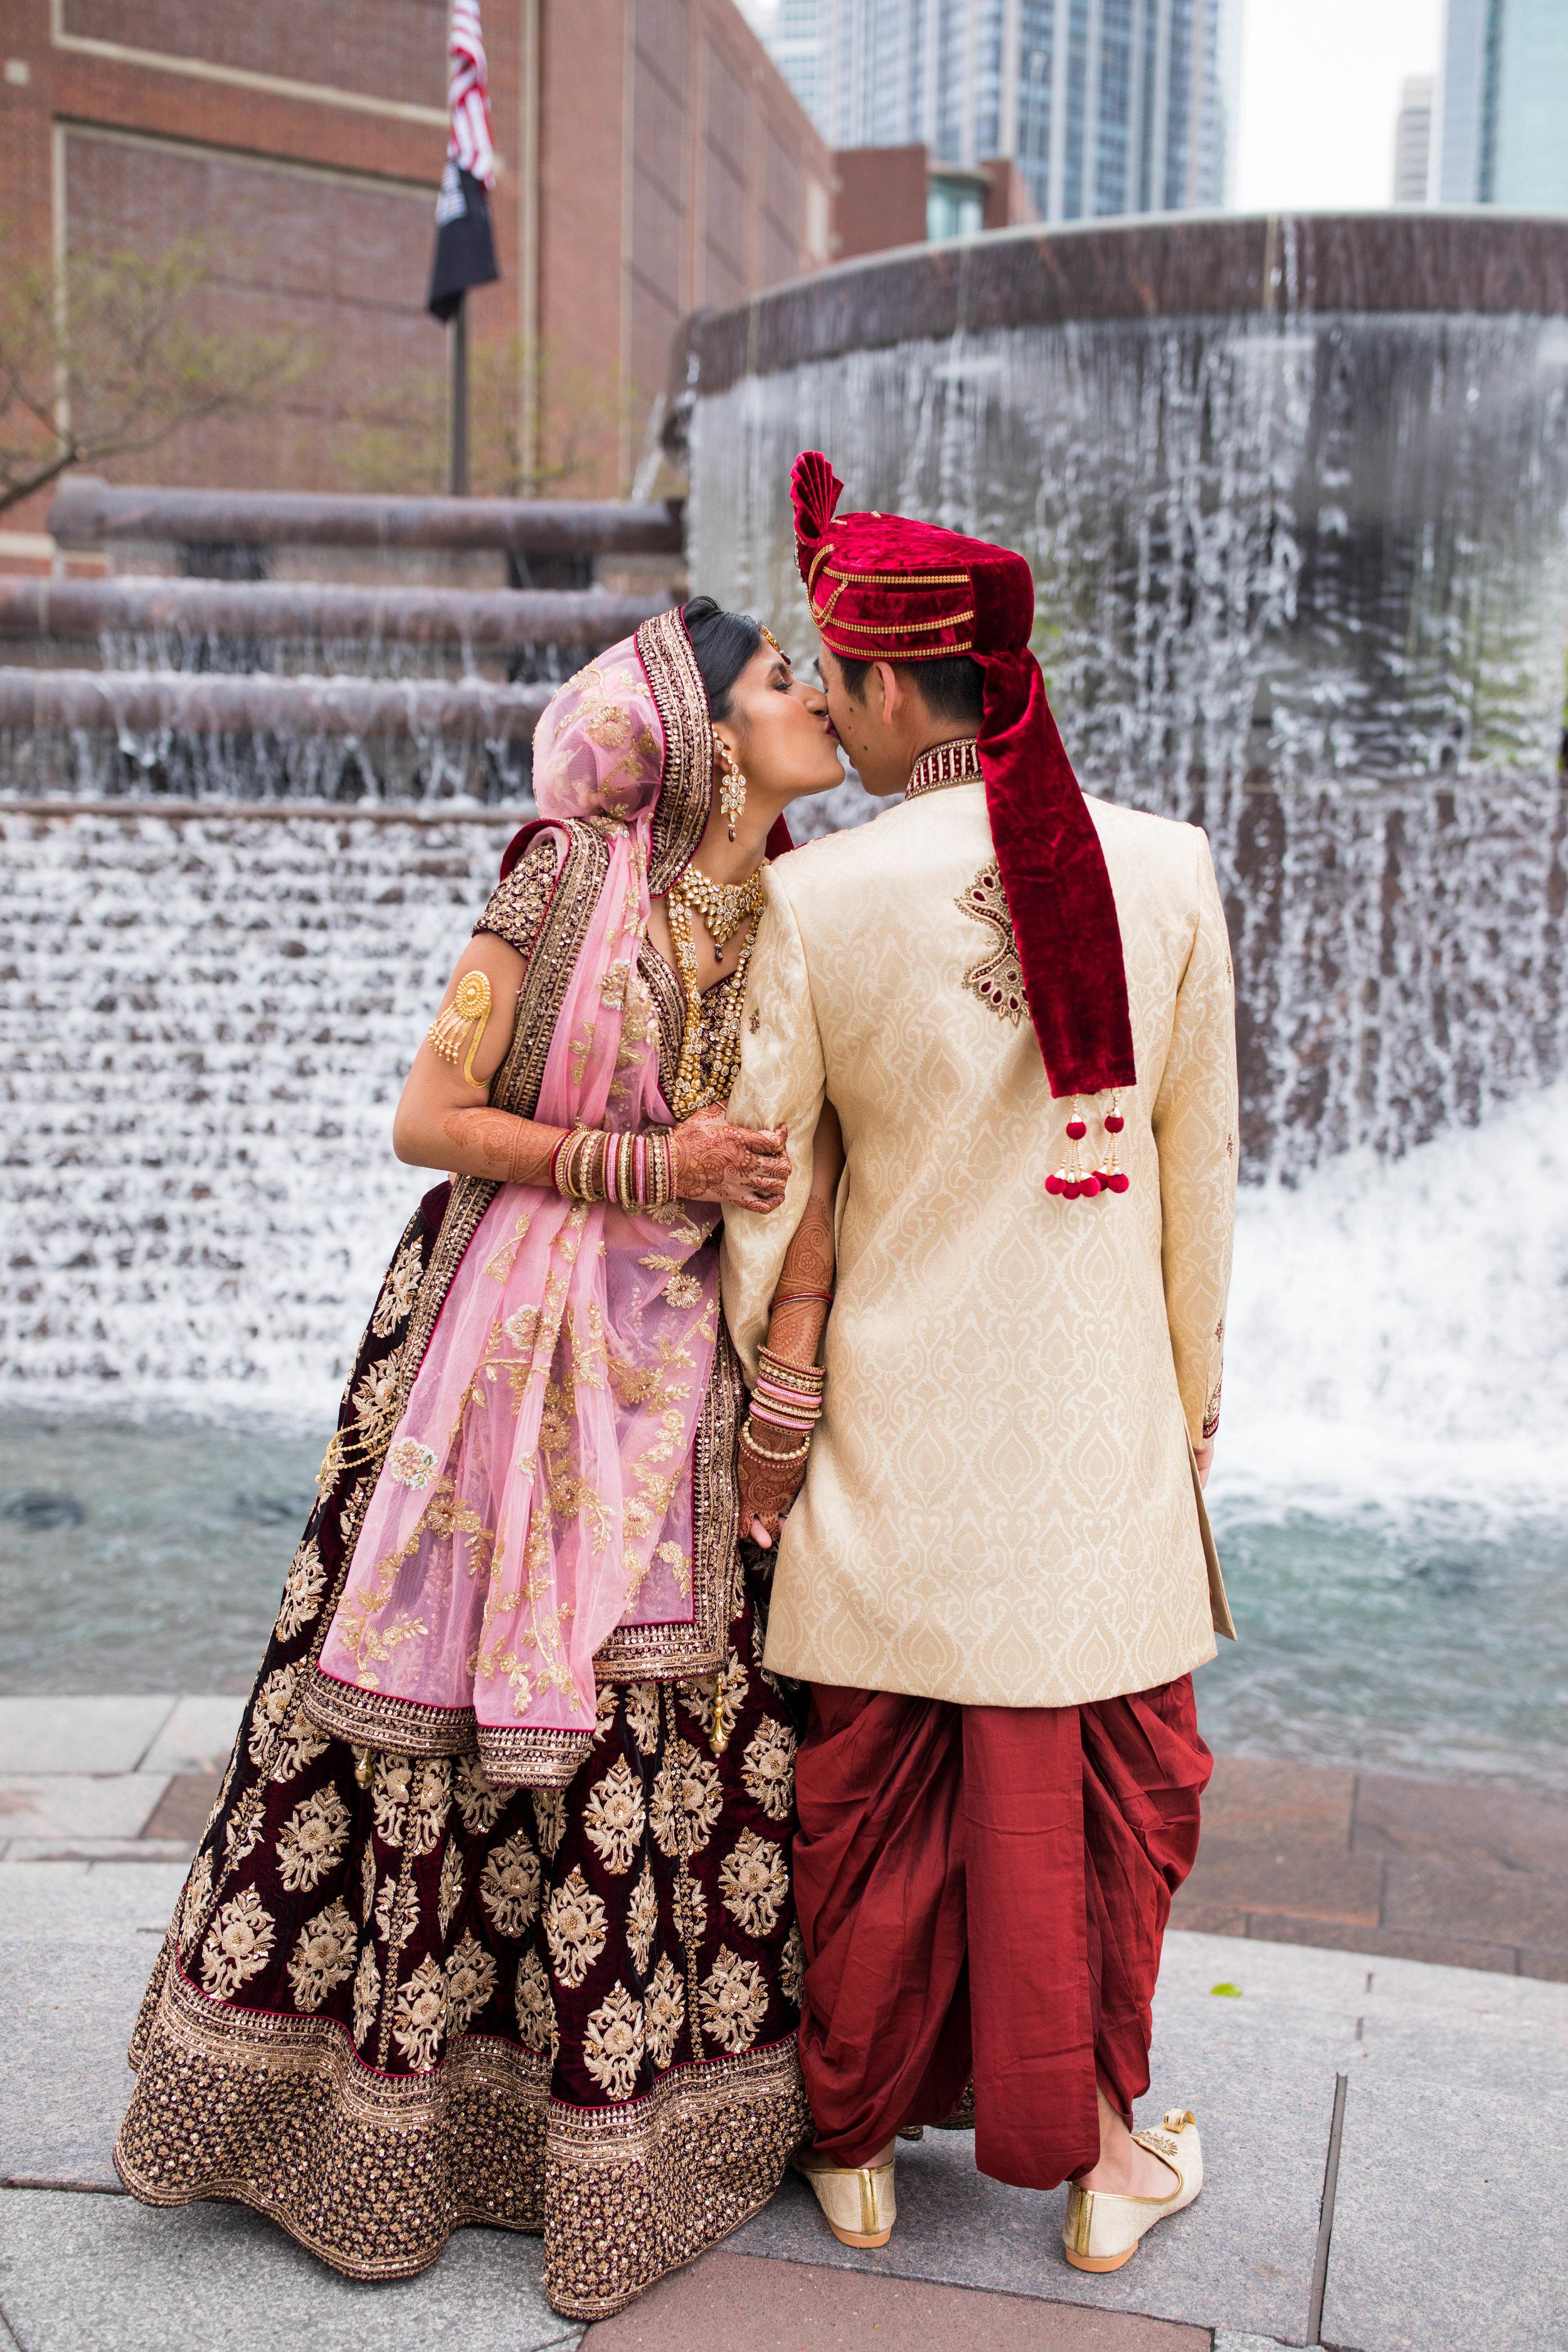 LeCapeWeddings - Chicago South Asian Wedding -51.jpg